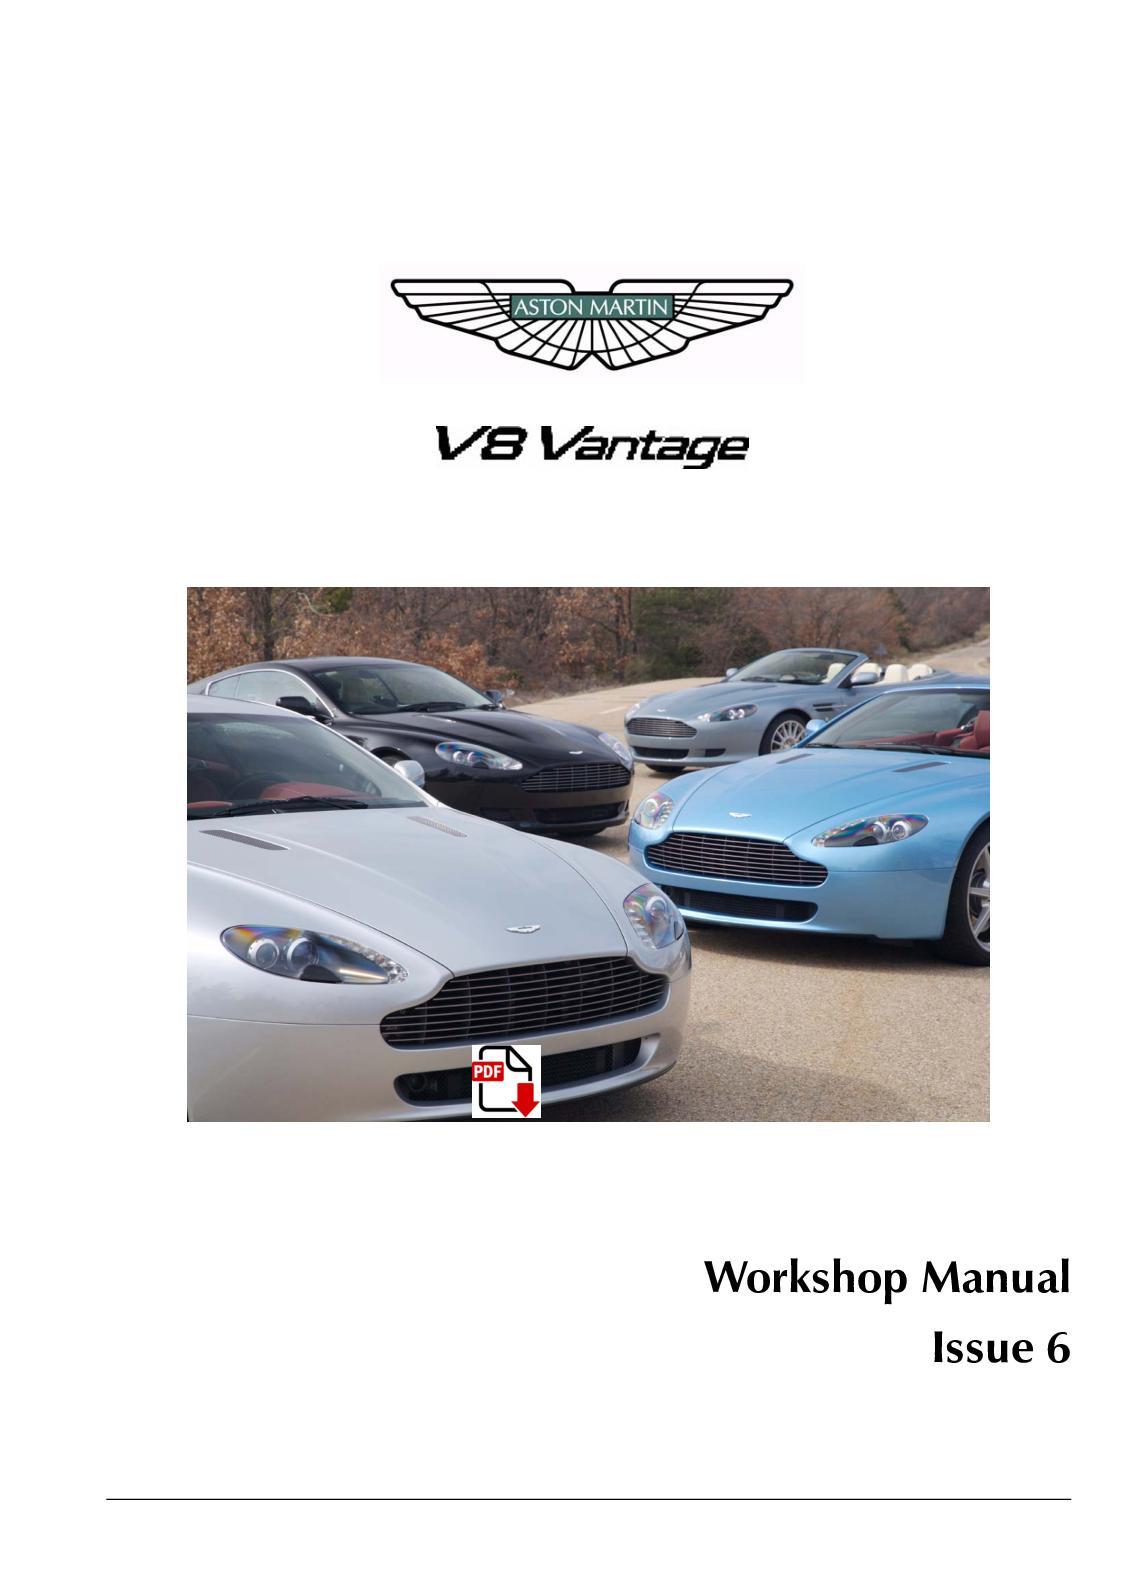 Calameo Aston Martin Db9 V8 Vantage Factory Service Manual